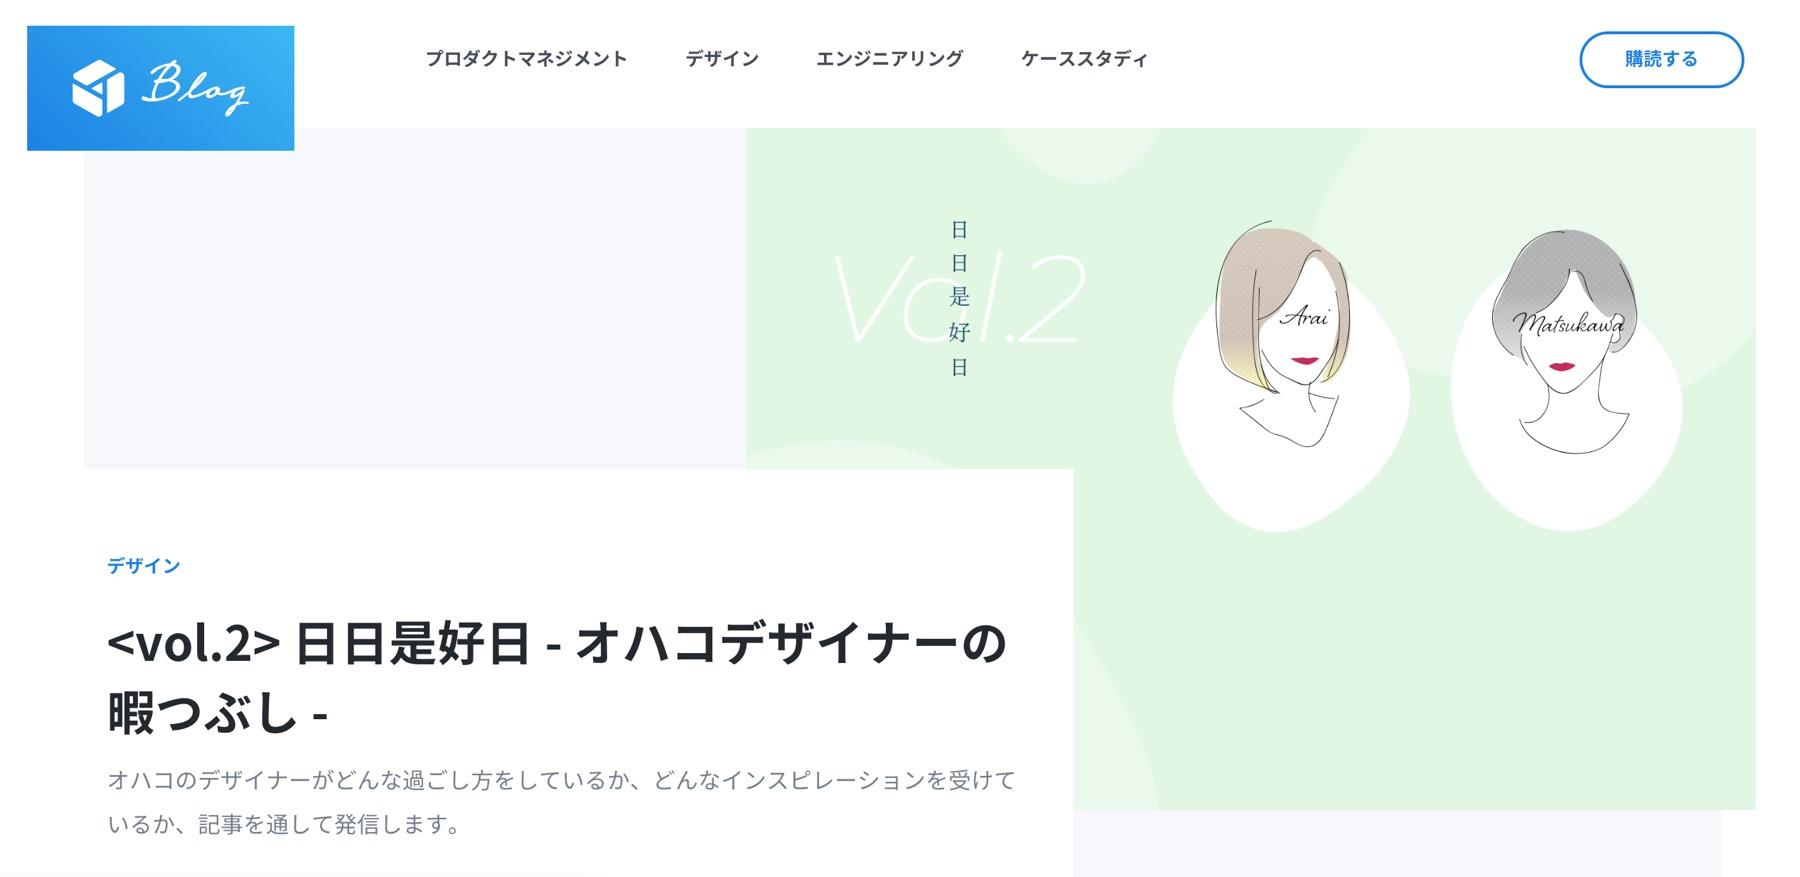 OHAKO Blog